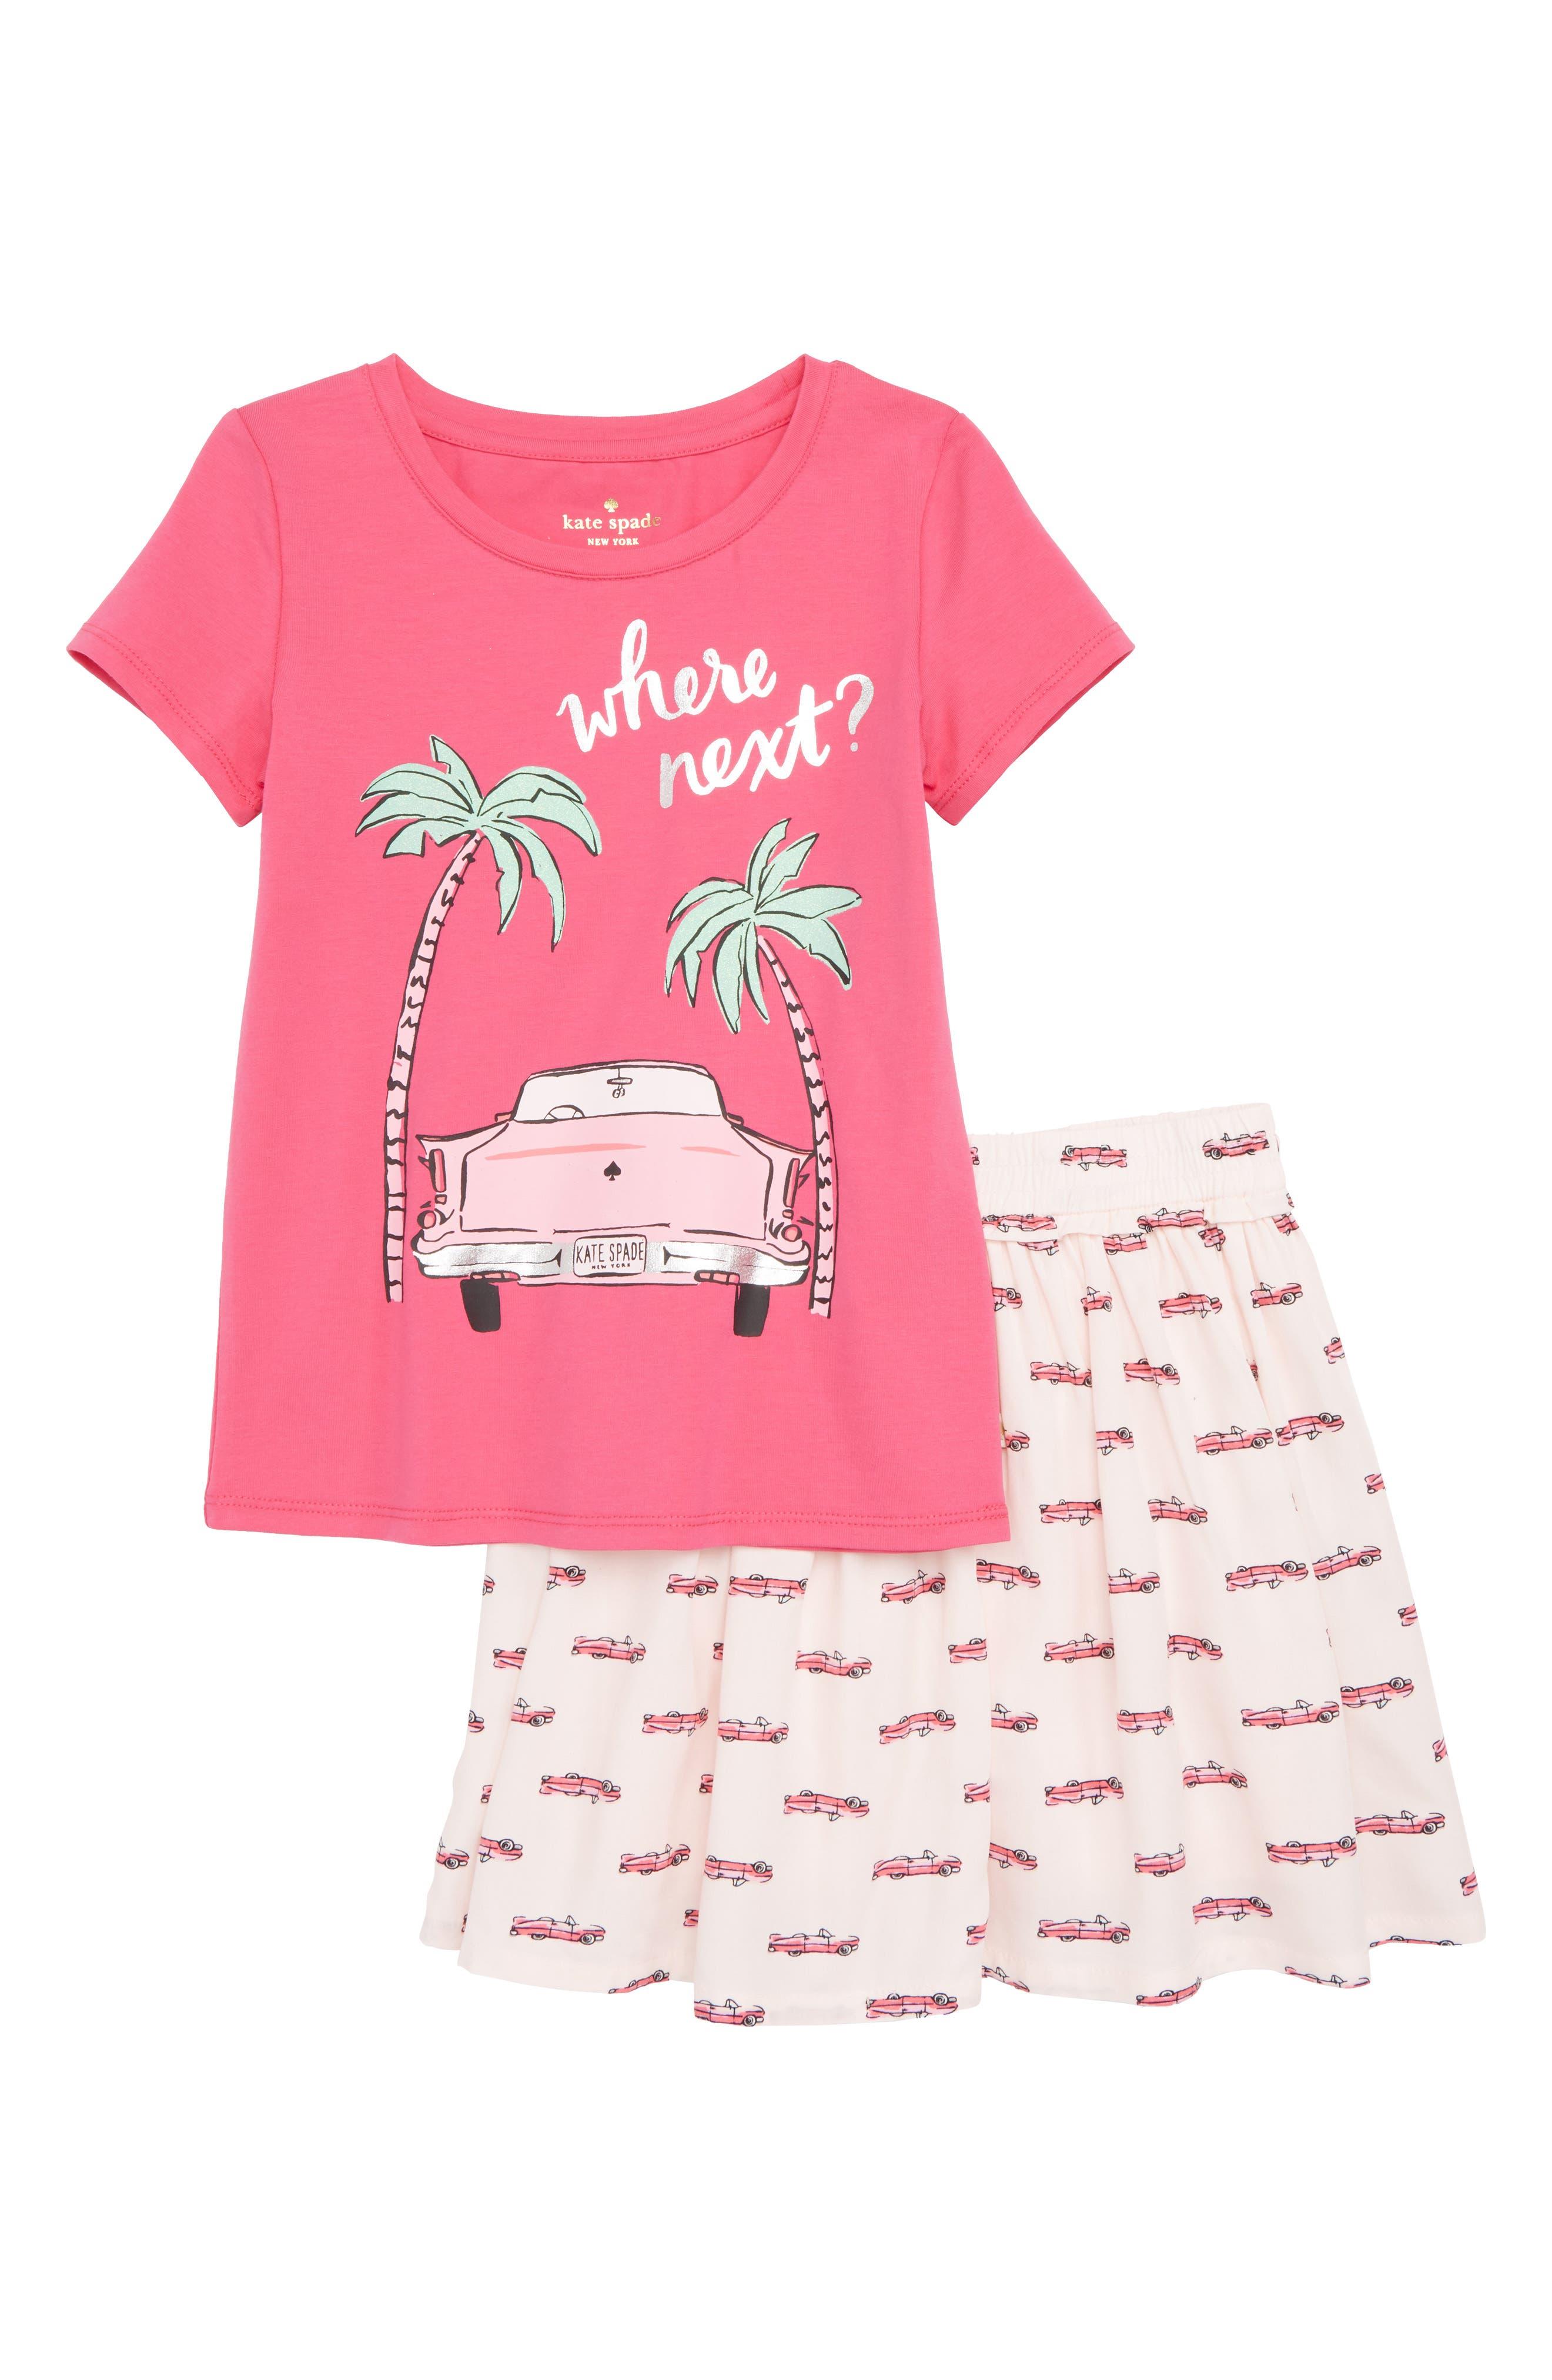 Main Image - kate spade new york where next top & skirt set (Toddler Girls & Little Girls)